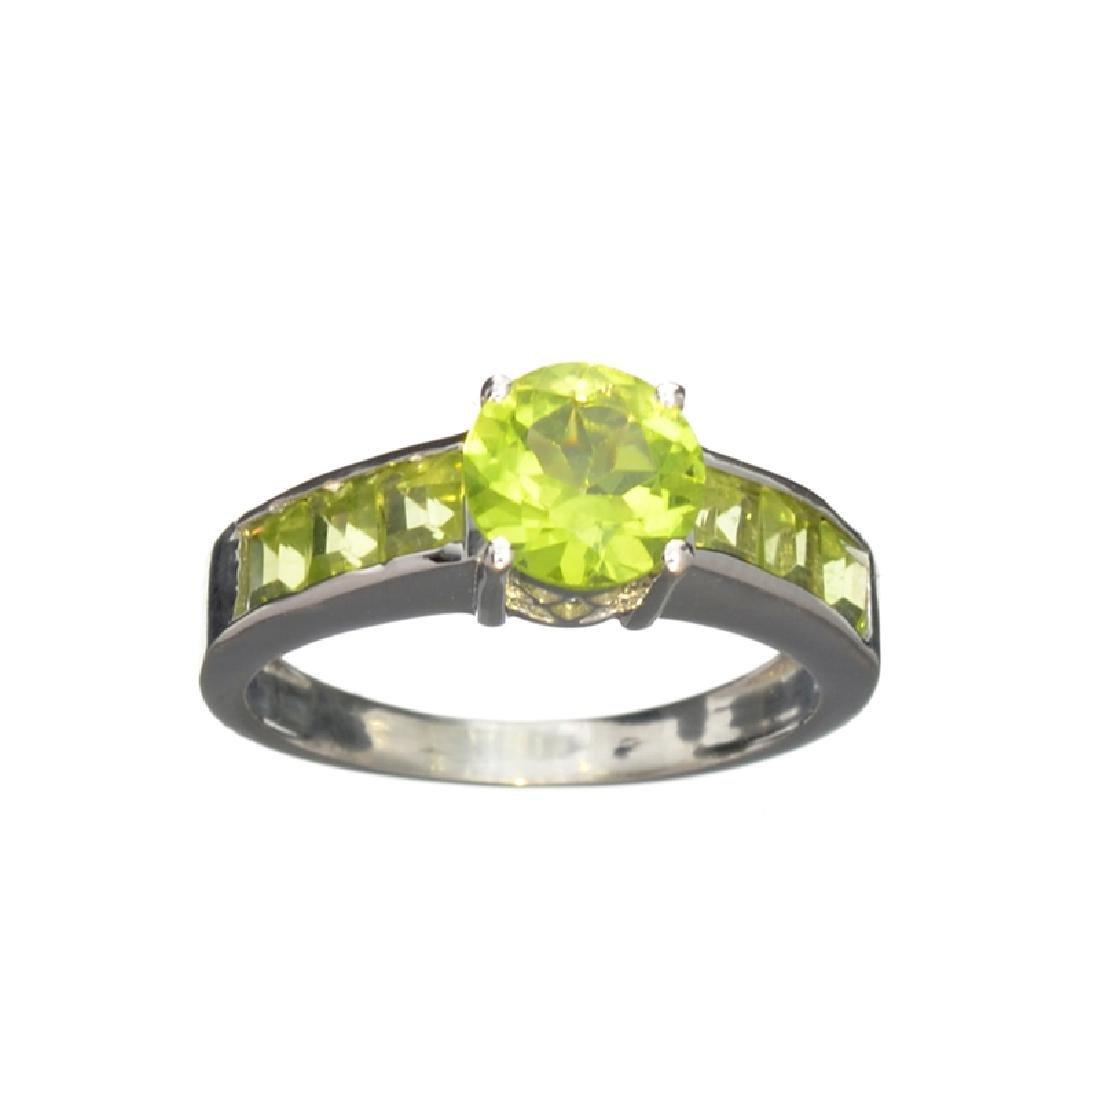 APP: 0.5k Fine Jewelry 2.60CT Green Peridot And